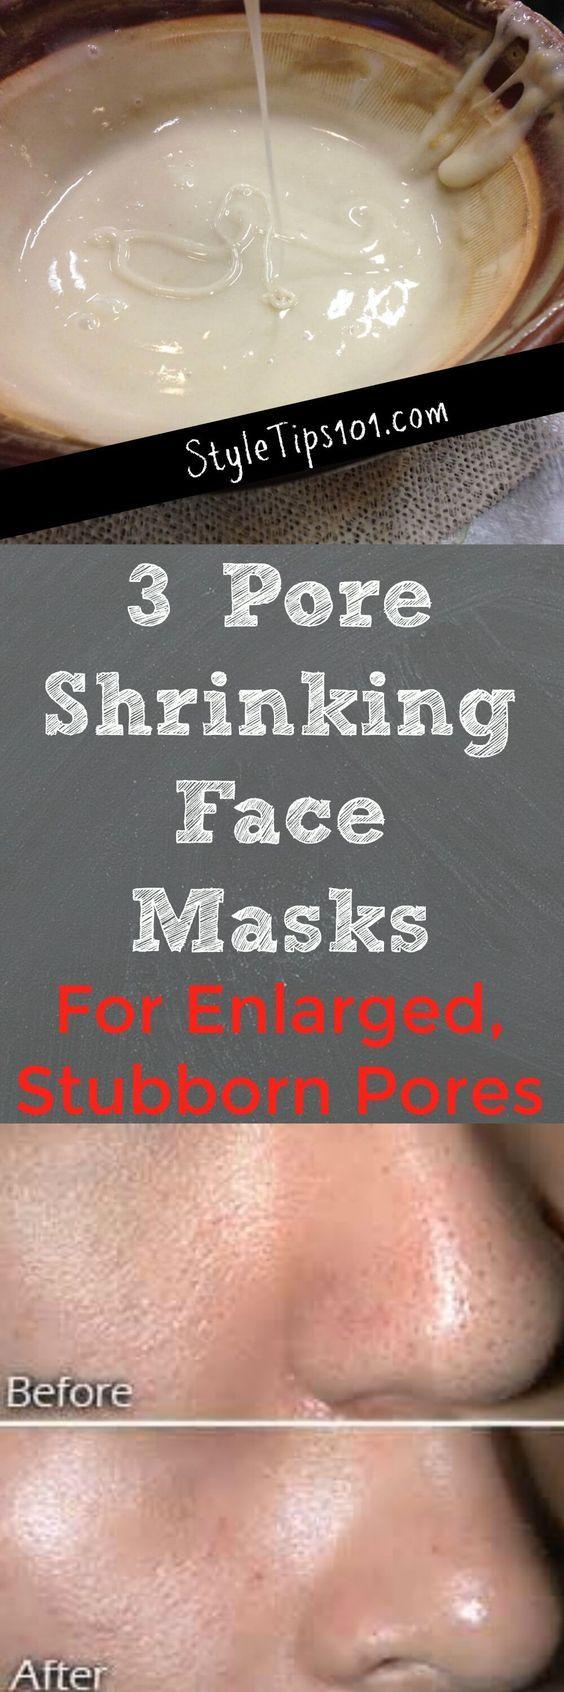 3 Pore Shrinking Face Masks You Should Make Today!